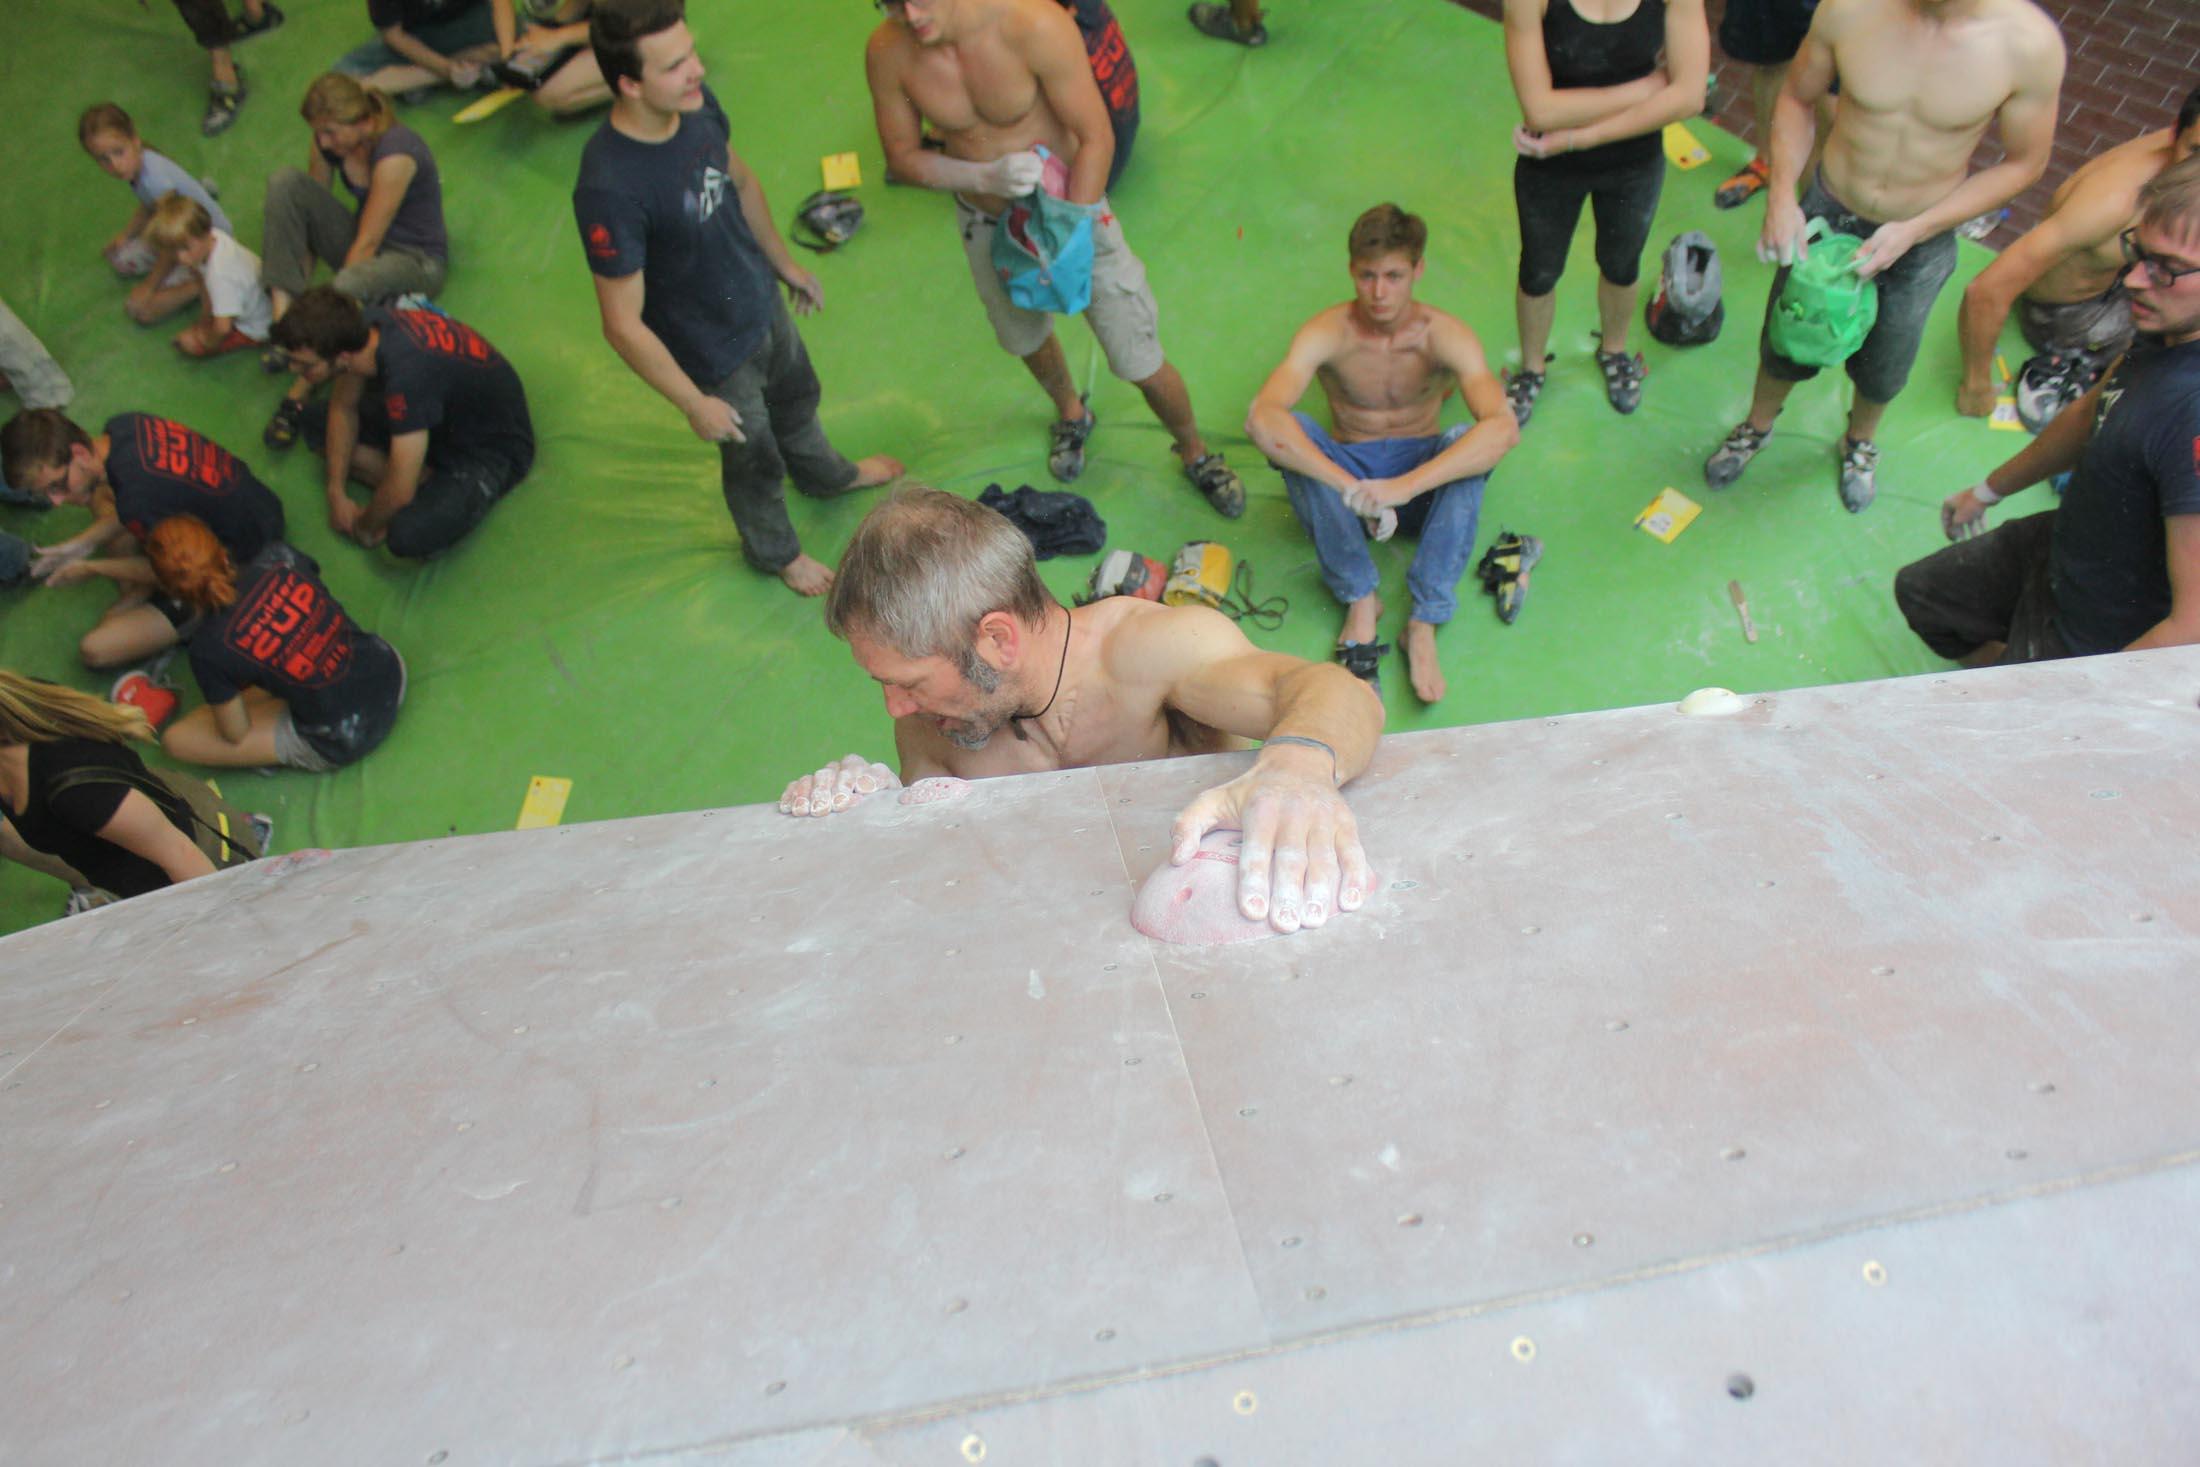 Quali, internationaler bouldercup Frankenjura 2016, BLOCKHELDEN Erlangen, Mammut, Bergfreunde.de, Boulderwettkampf07092016297